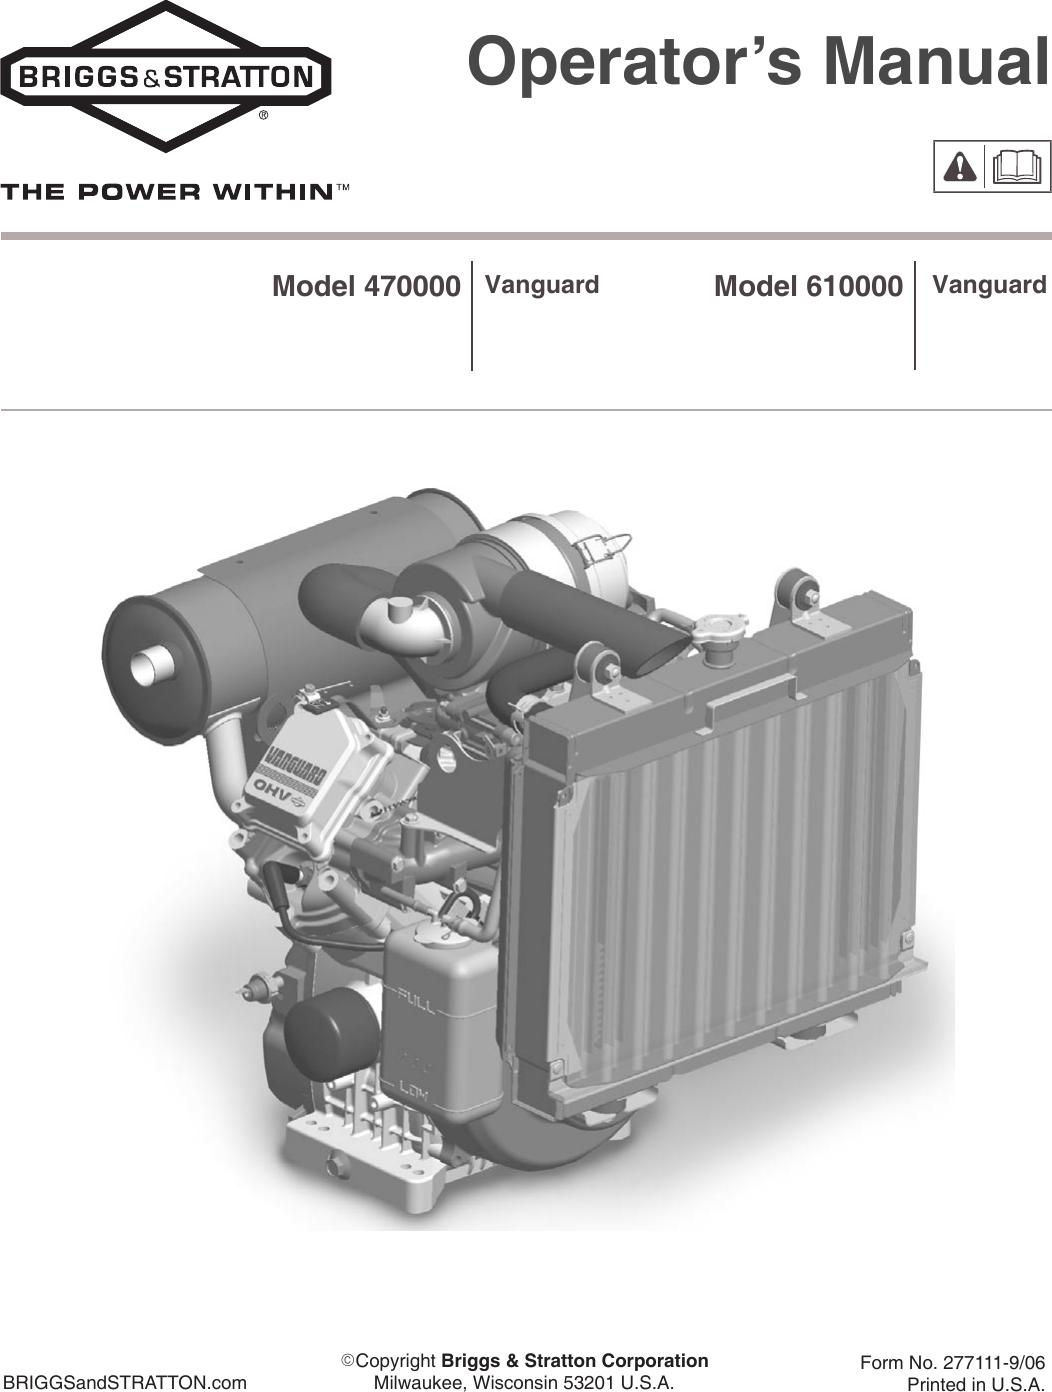 Vanguard 470000 User Manual To The 2893fafb ed2e 46f4 fd2f ...